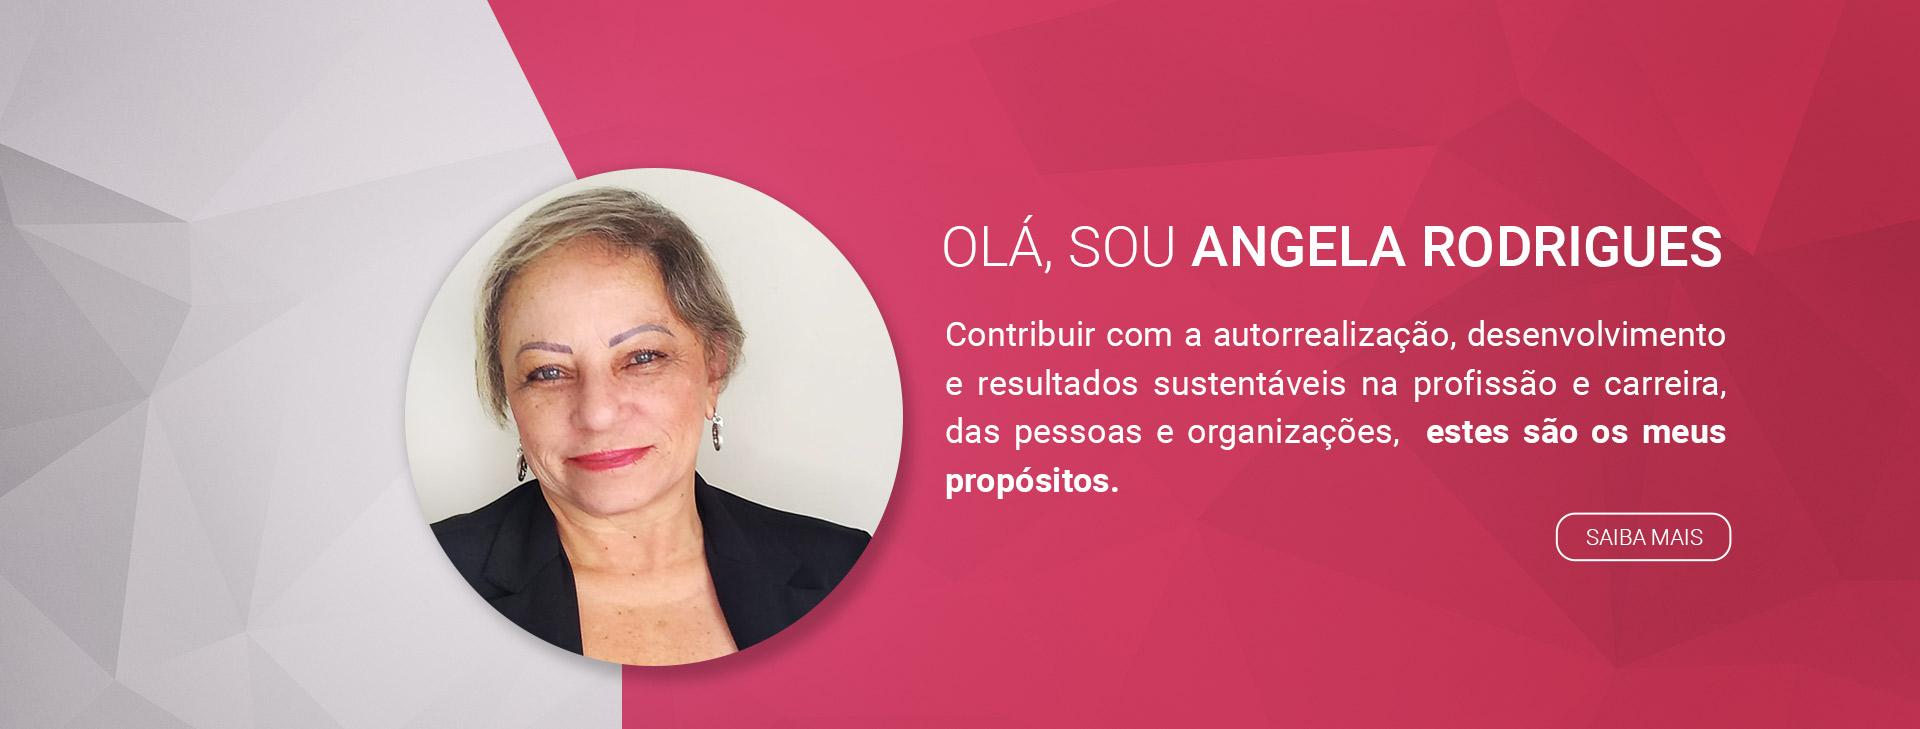 Olá, sou Angela Rodrigues